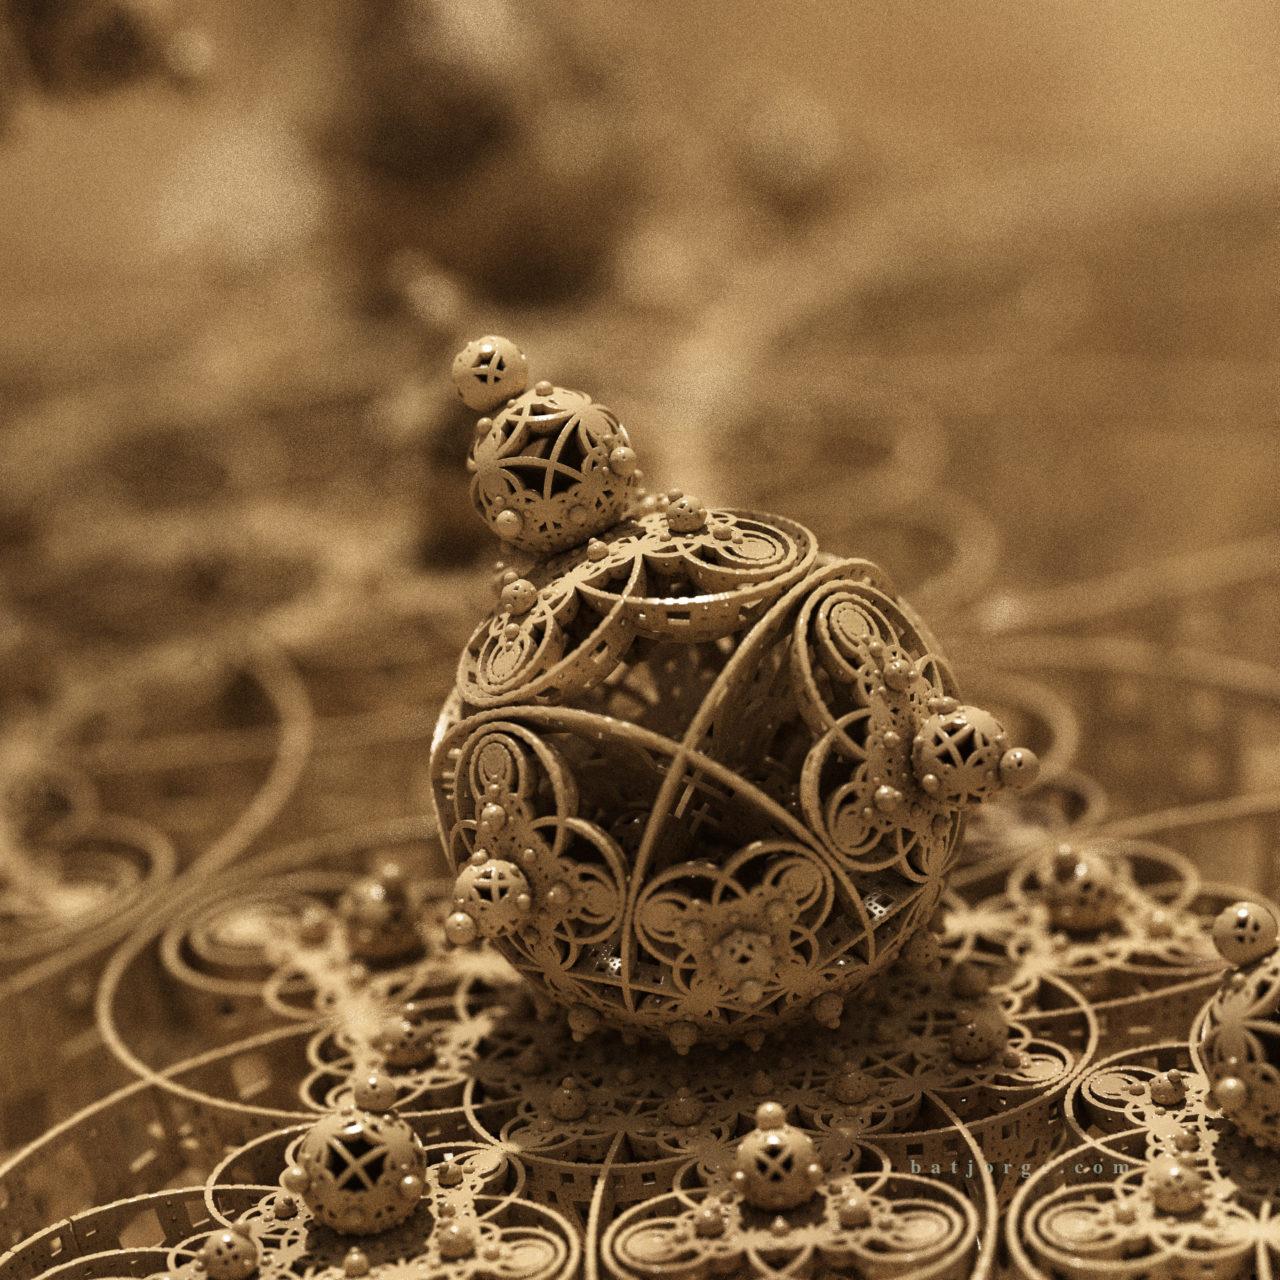 3D fractal orb. menger. mandelbulber